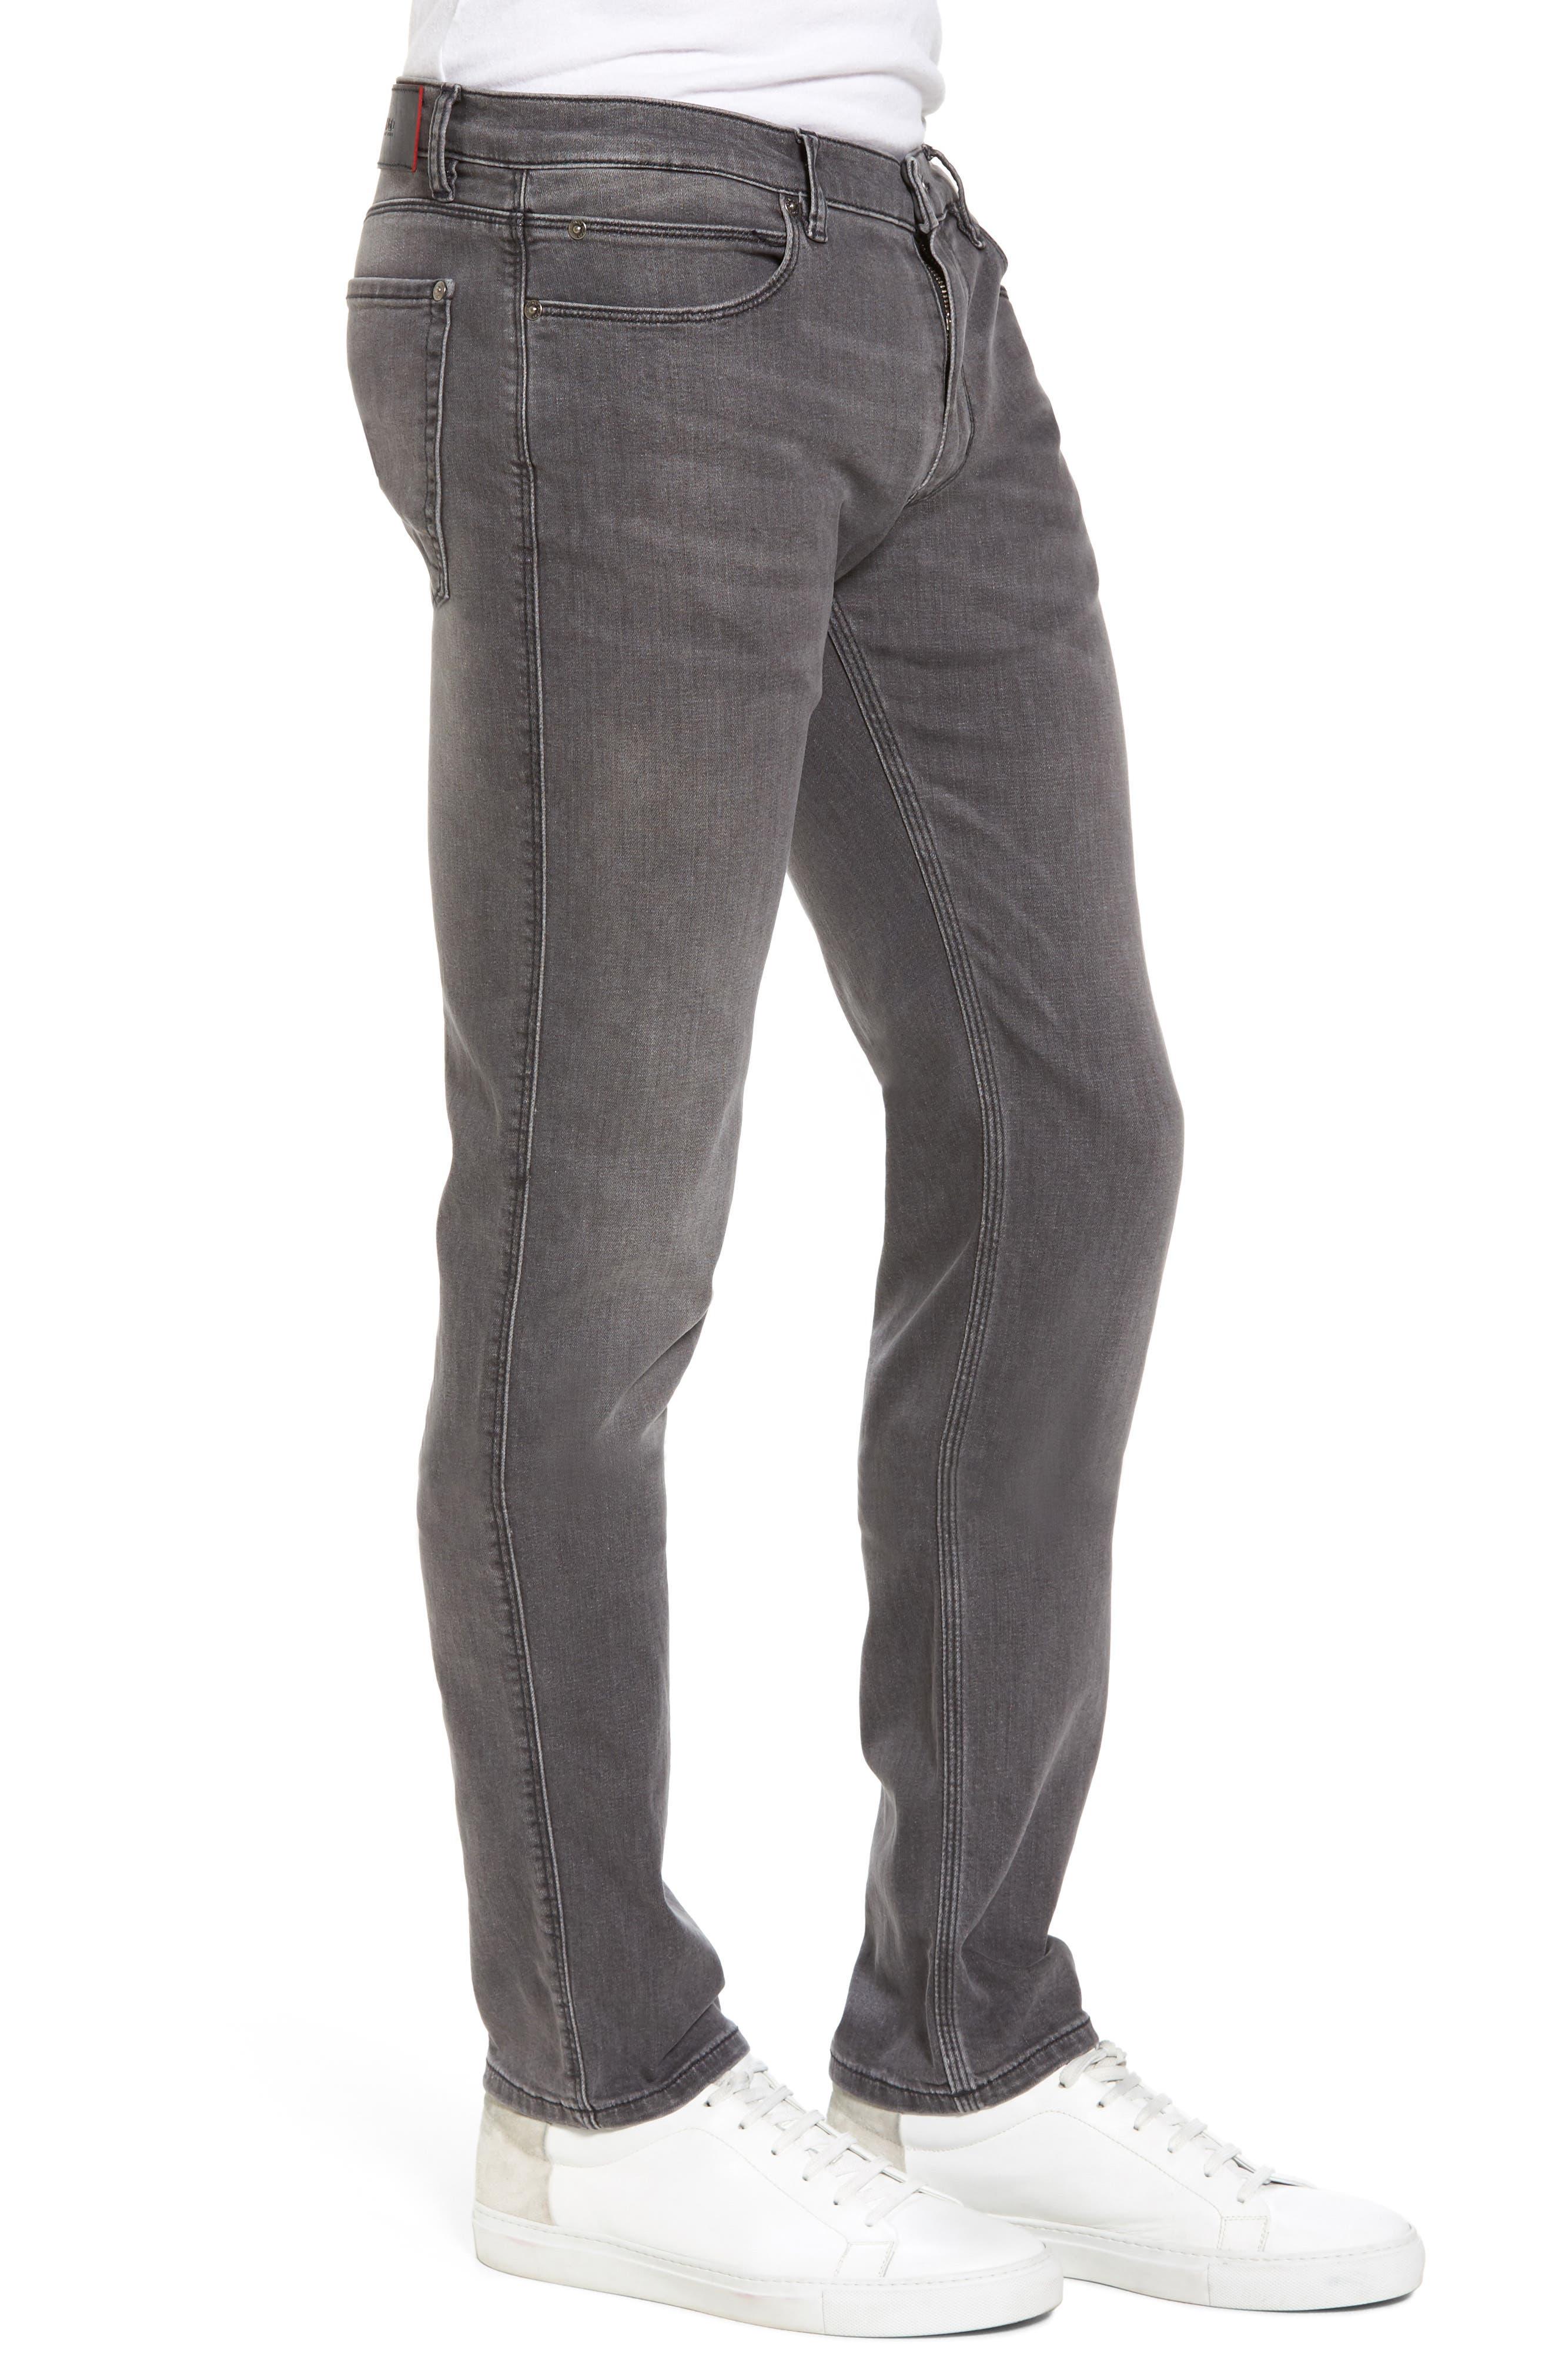 Hugo Boss 708 Stonewash Denim Jeans,                             Alternate thumbnail 3, color,                             021